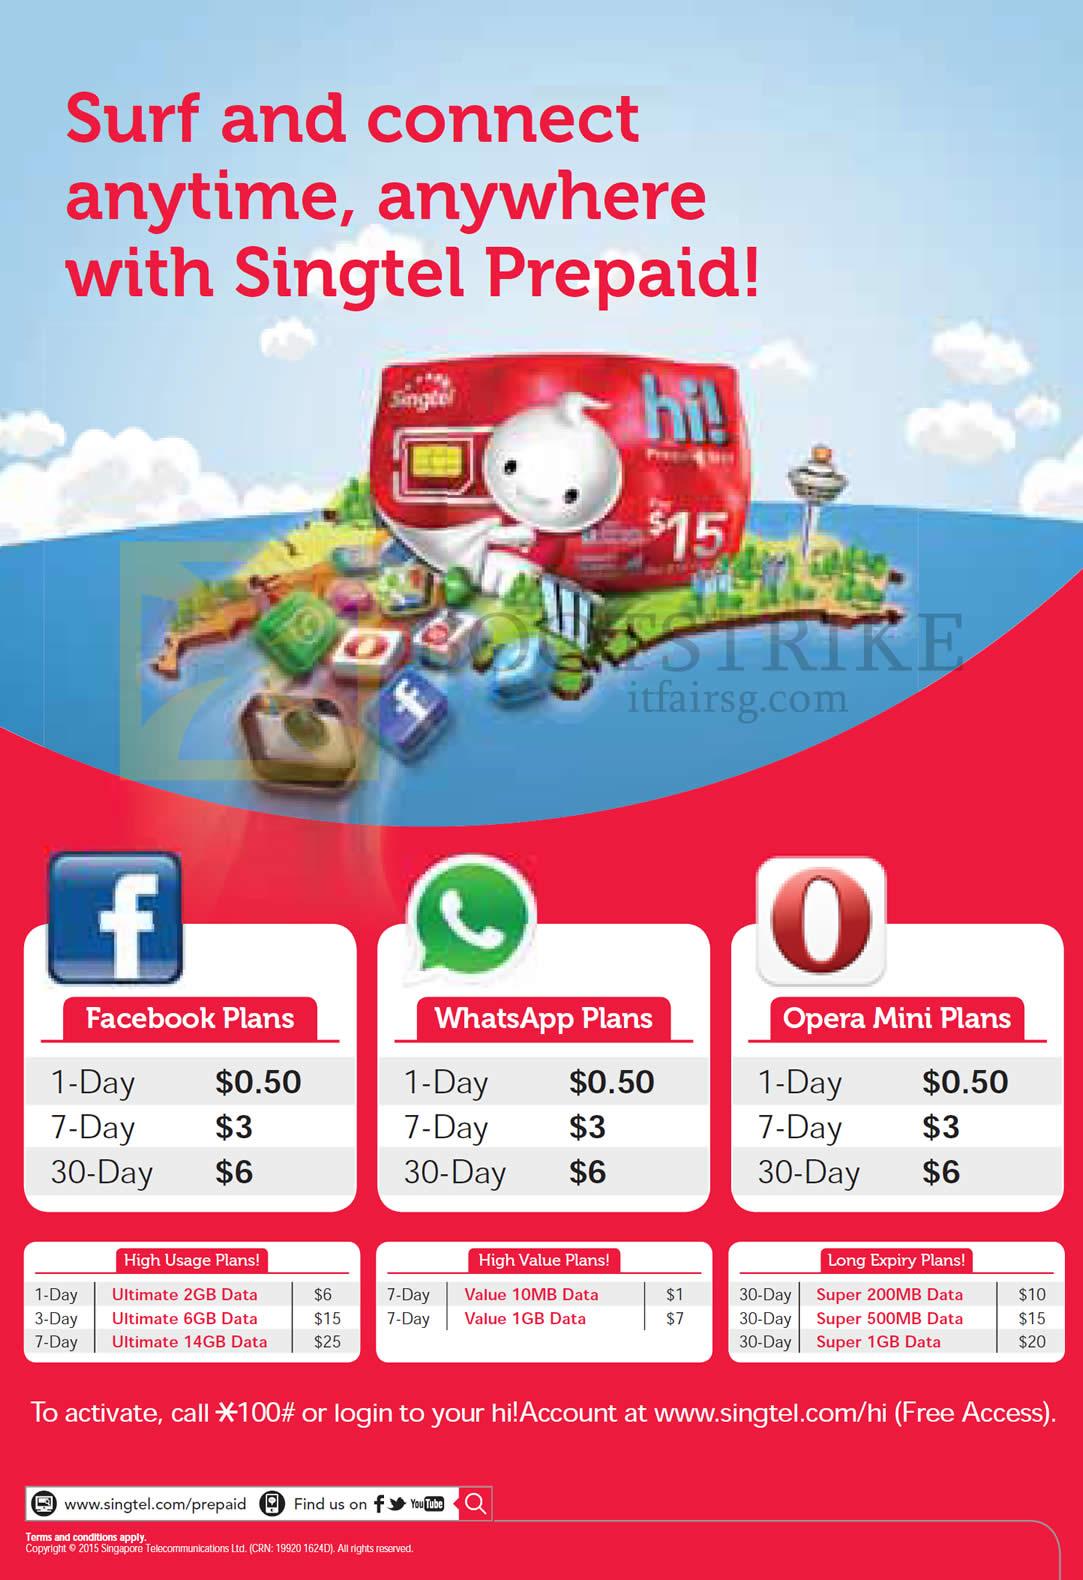 IT SHOW 2015 price list image brochure of Singtel Prepaid, Facebook Plans, WhatsApp Plans, Opera Mini Plans